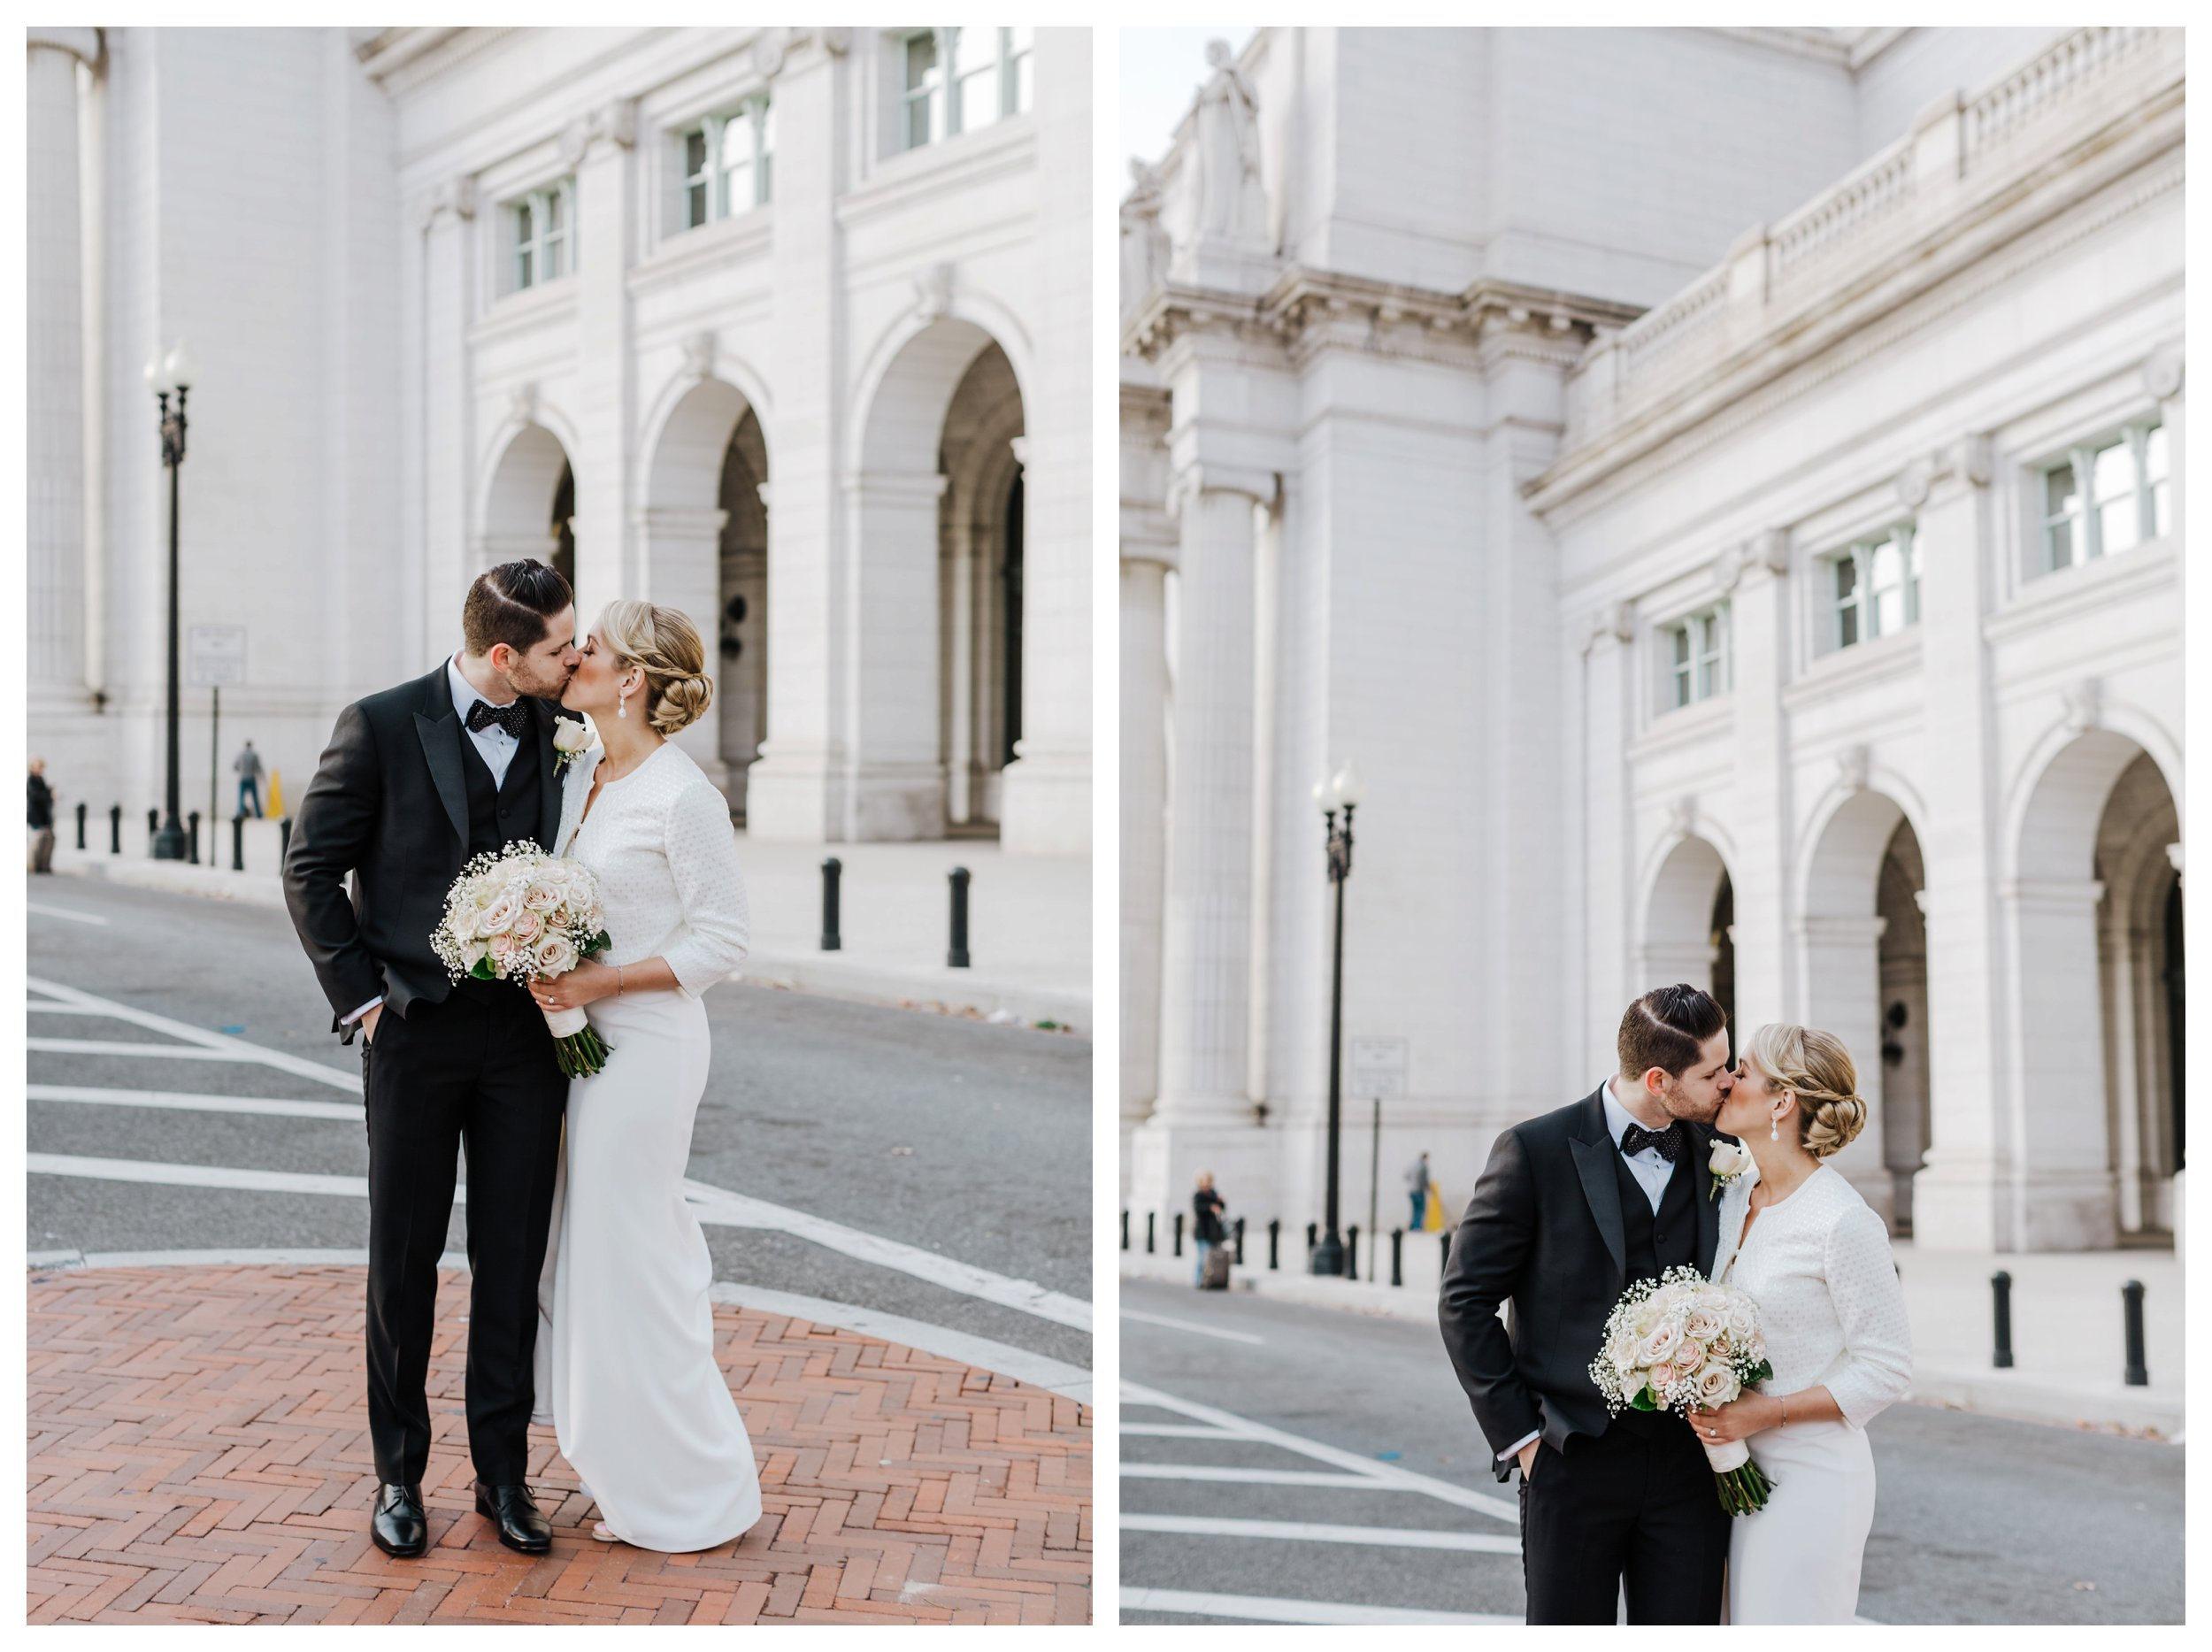 washington-dc-wedding-photographer-26.JPG